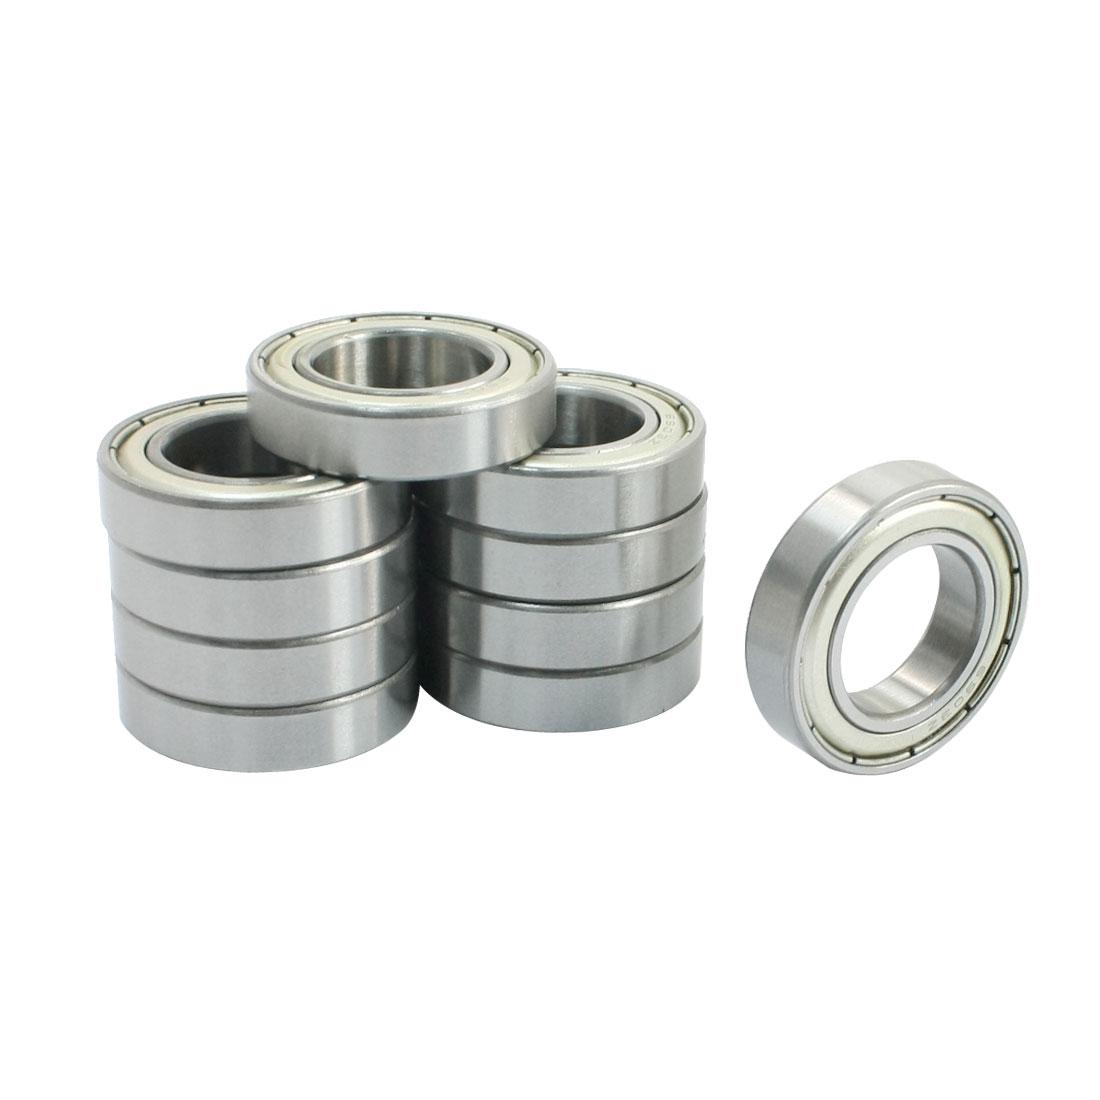 6903Z 17x30x7mm Metal Sealed Deep Groove Radial Ball Bearings 10 Pcs